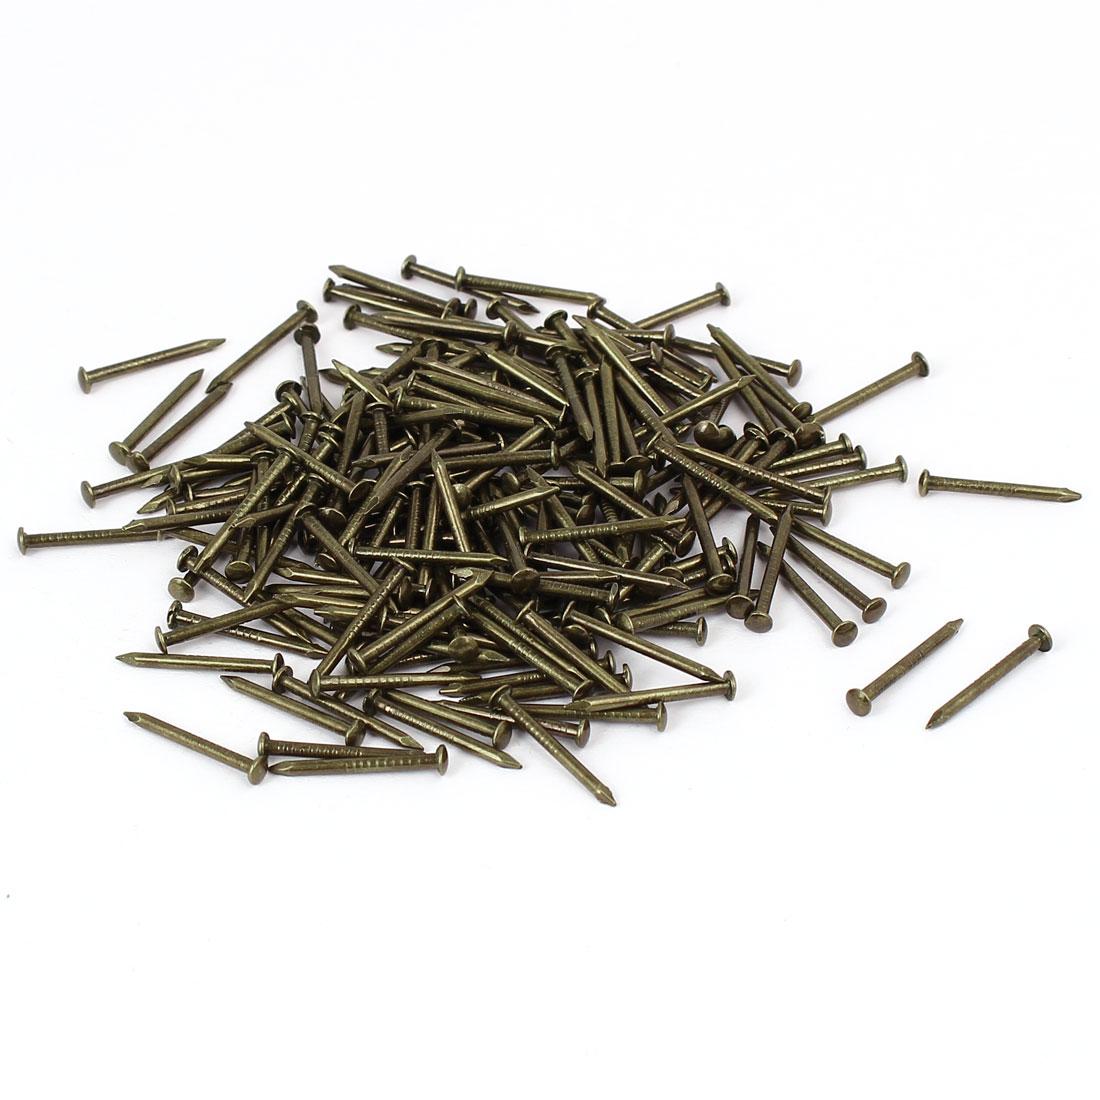 Home Furniture Upholstery Thumb Tack Nail Push Pin Bronze Tone 3mm x 17mm 200pcs